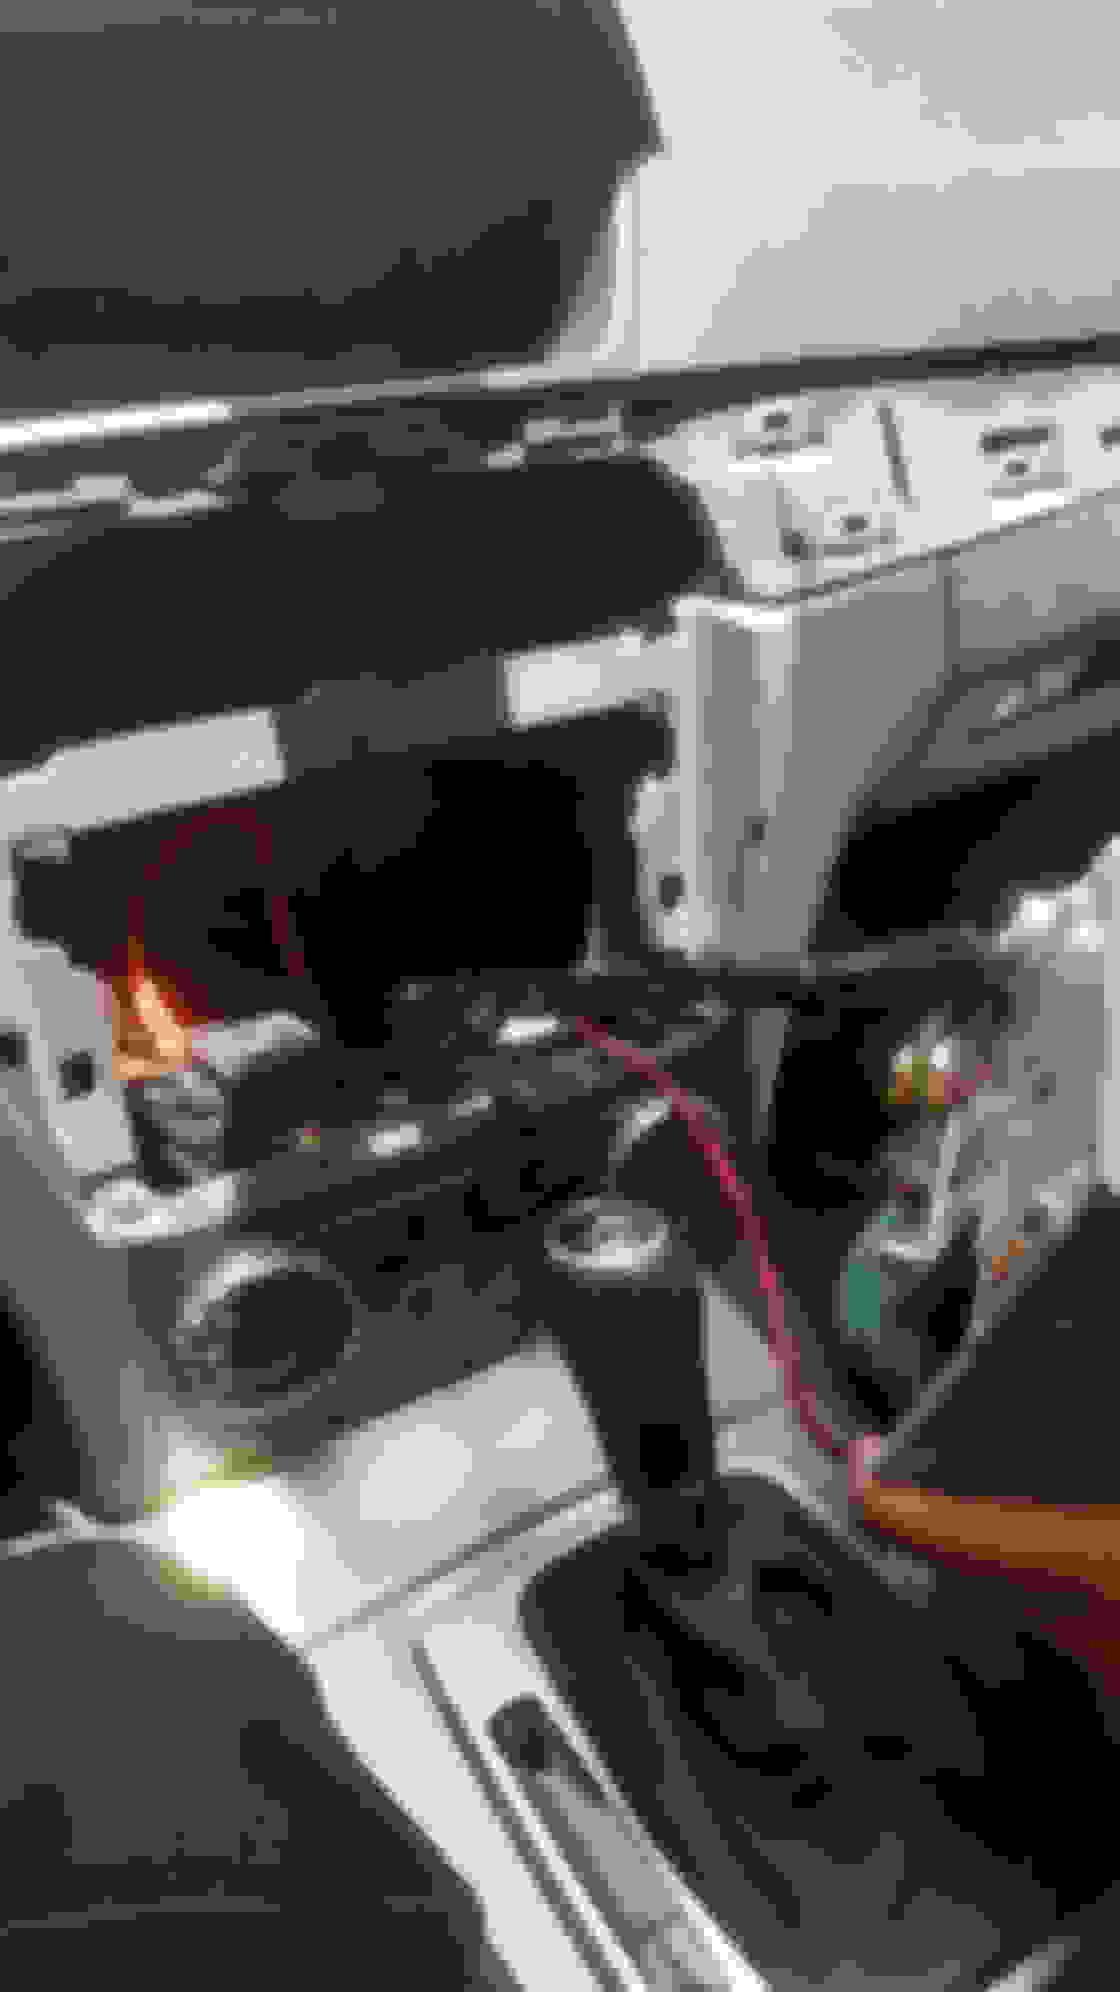 2013 C250 Mercedes Command no Power - MBWorld org Forums